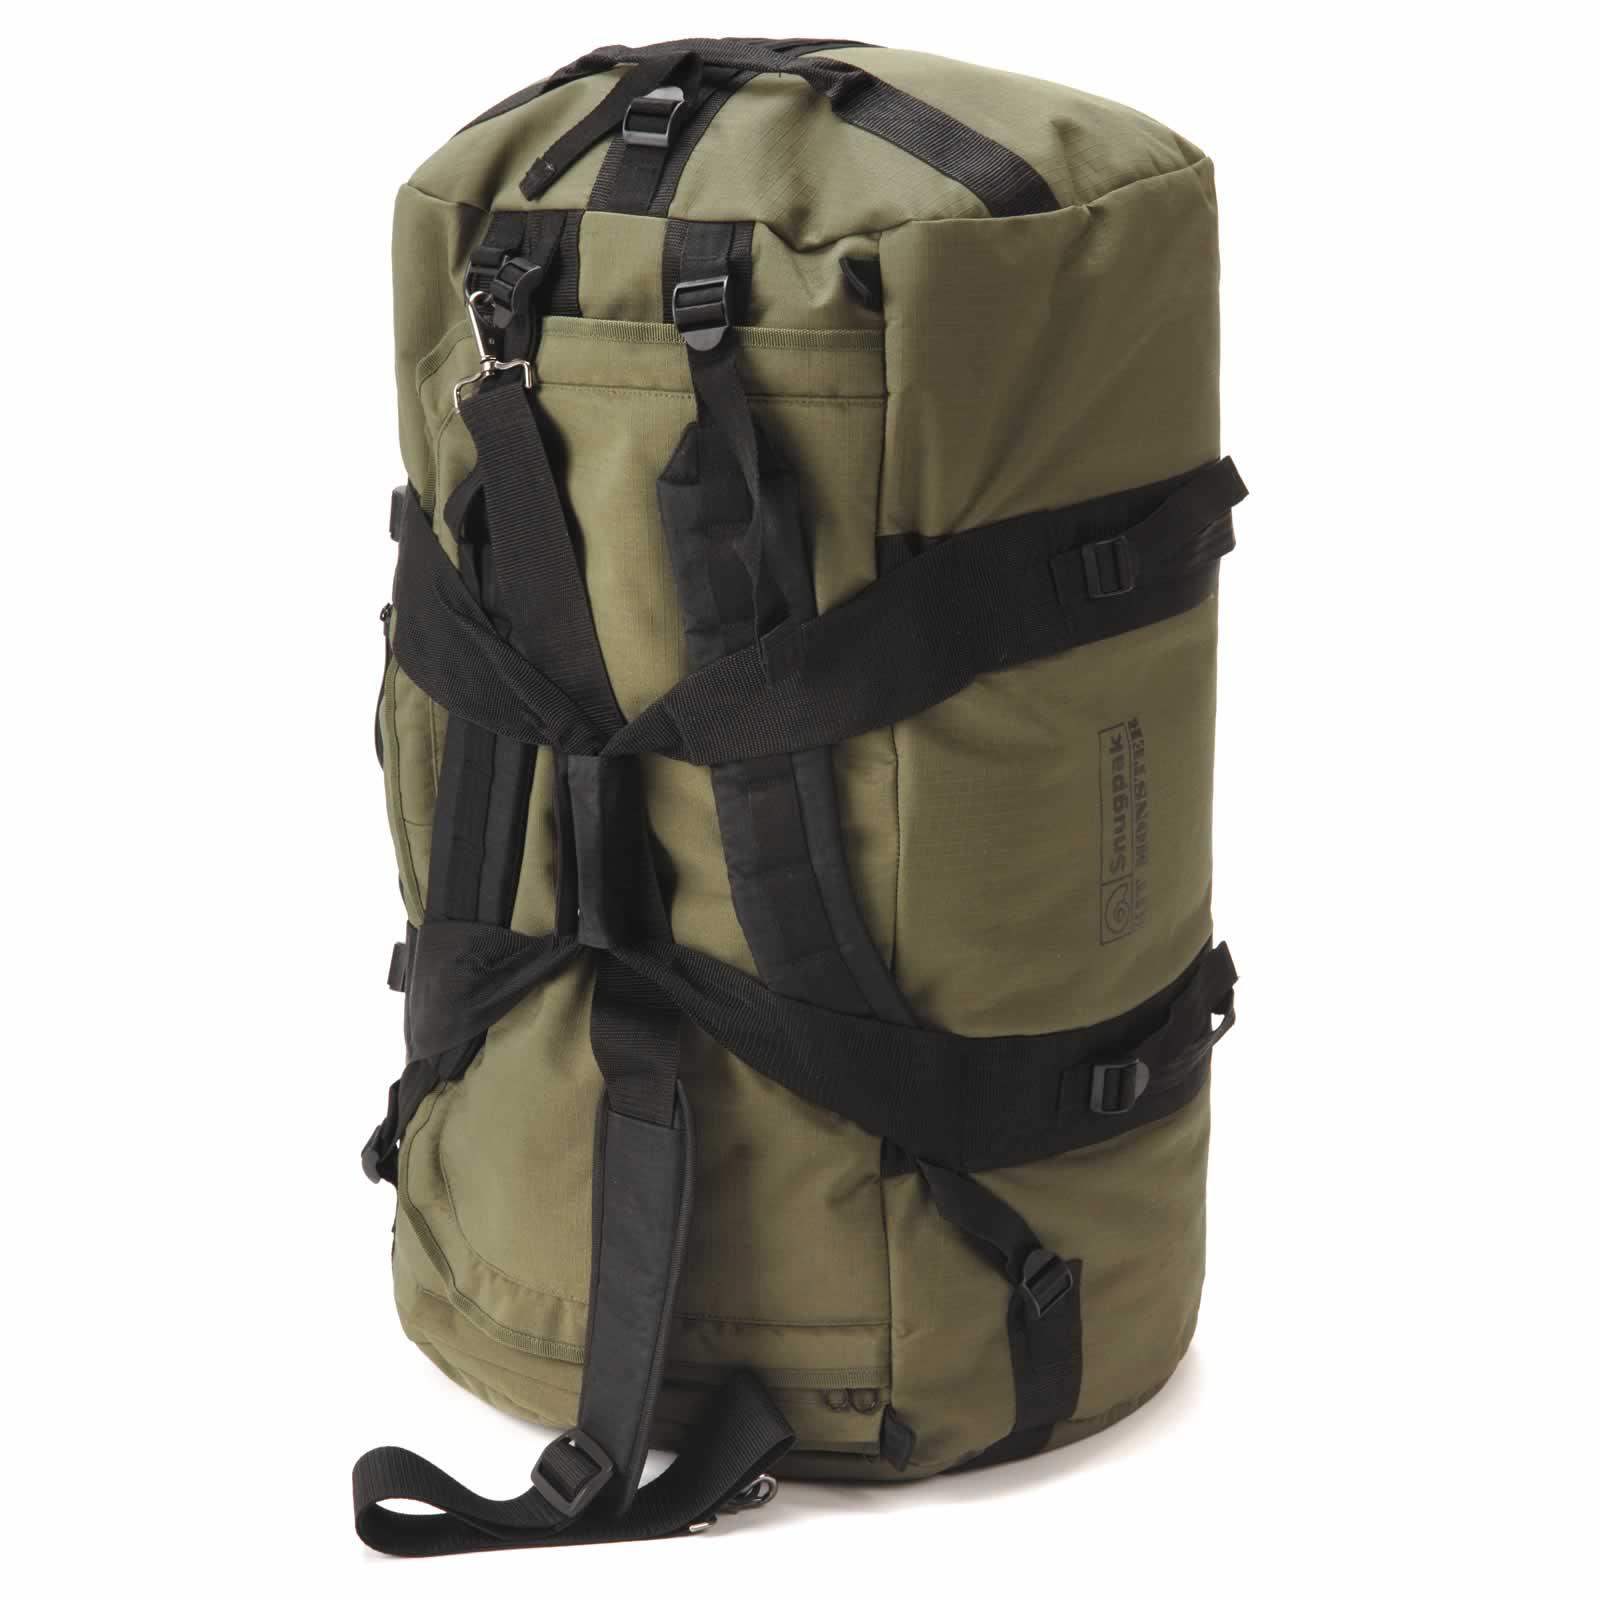 snugpak kit monster 120 litre army military holdall. Black Bedroom Furniture Sets. Home Design Ideas